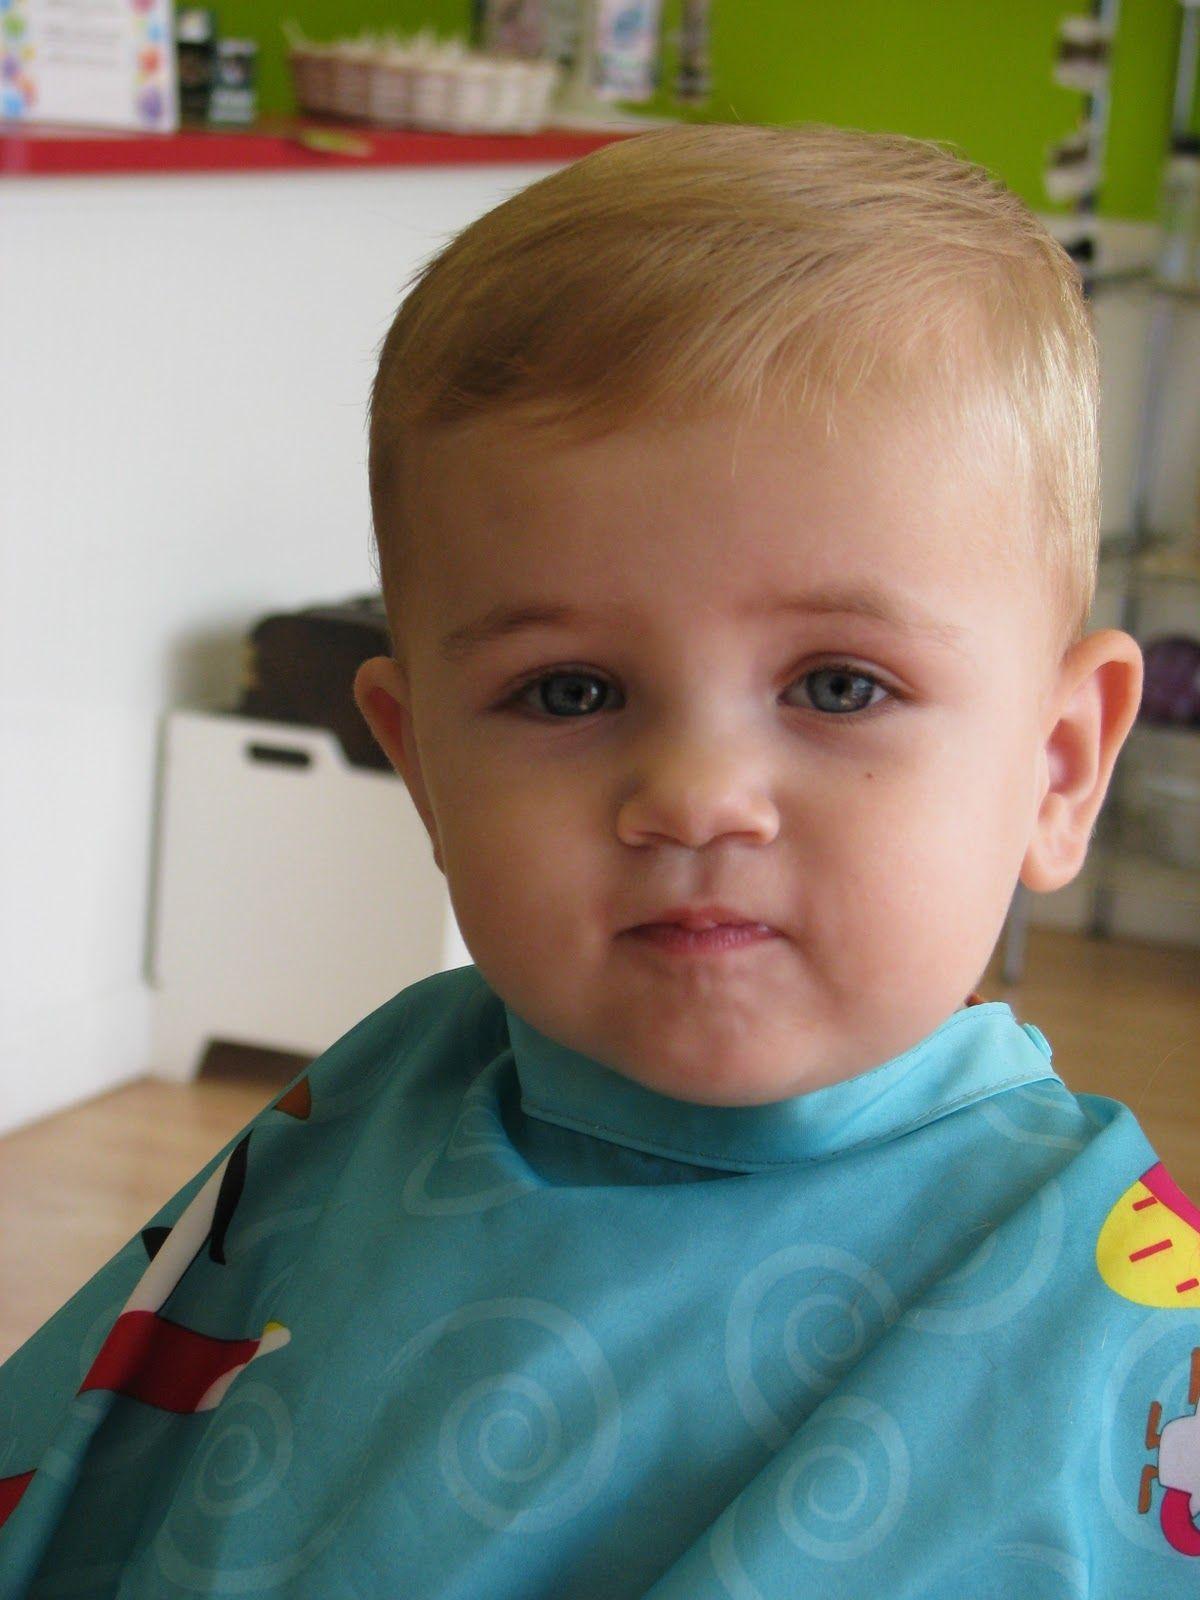 baby boy haircut haircuts